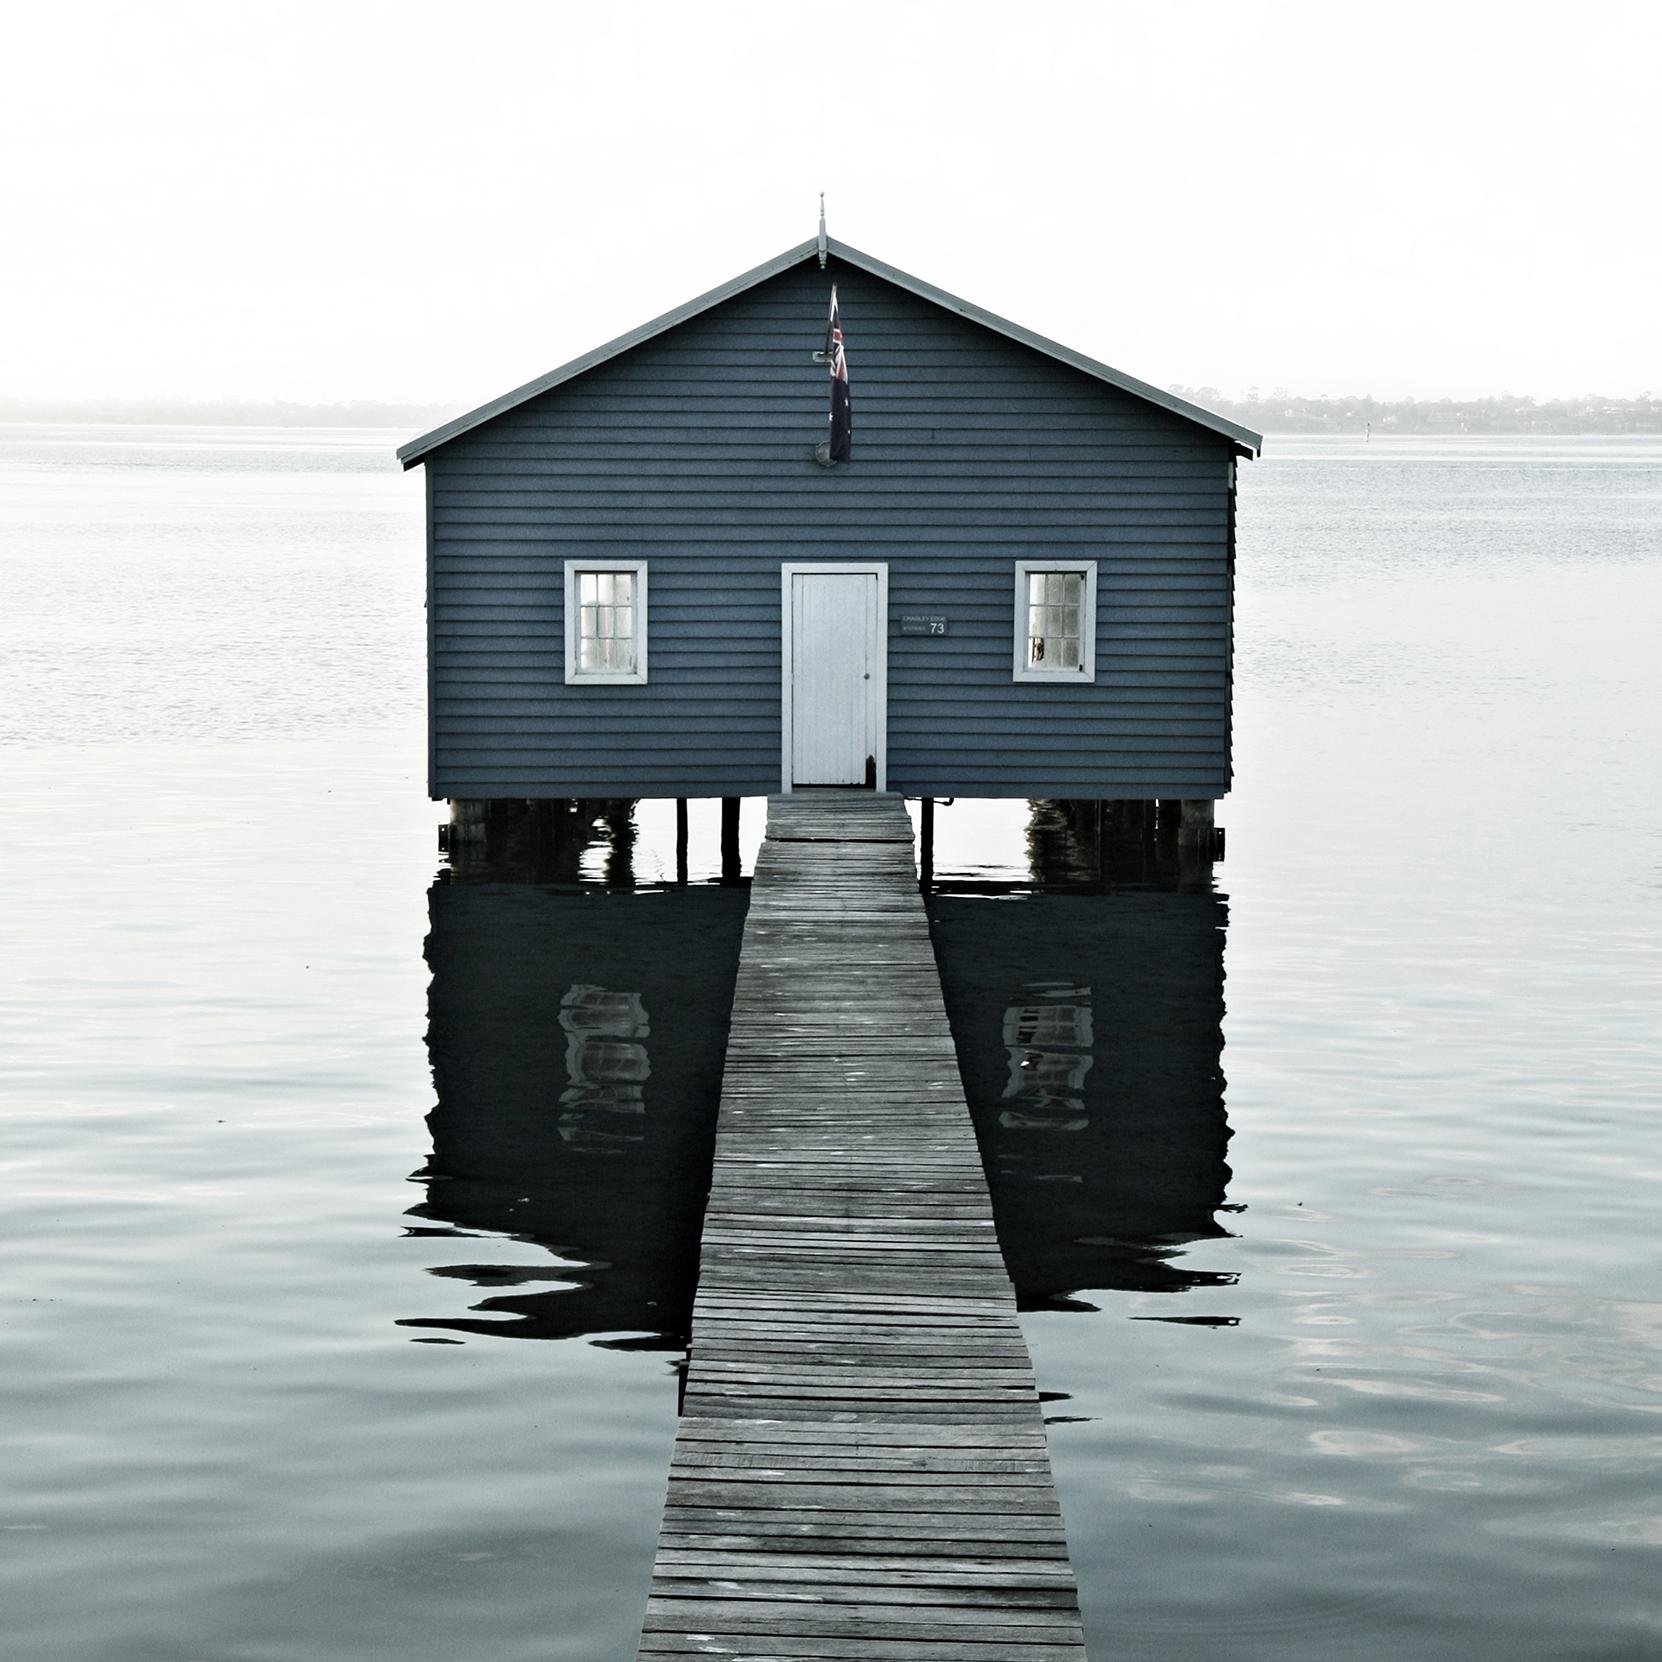 bilder fine art prints online kaufen pro office. Black Bedroom Furniture Sets. Home Design Ideas